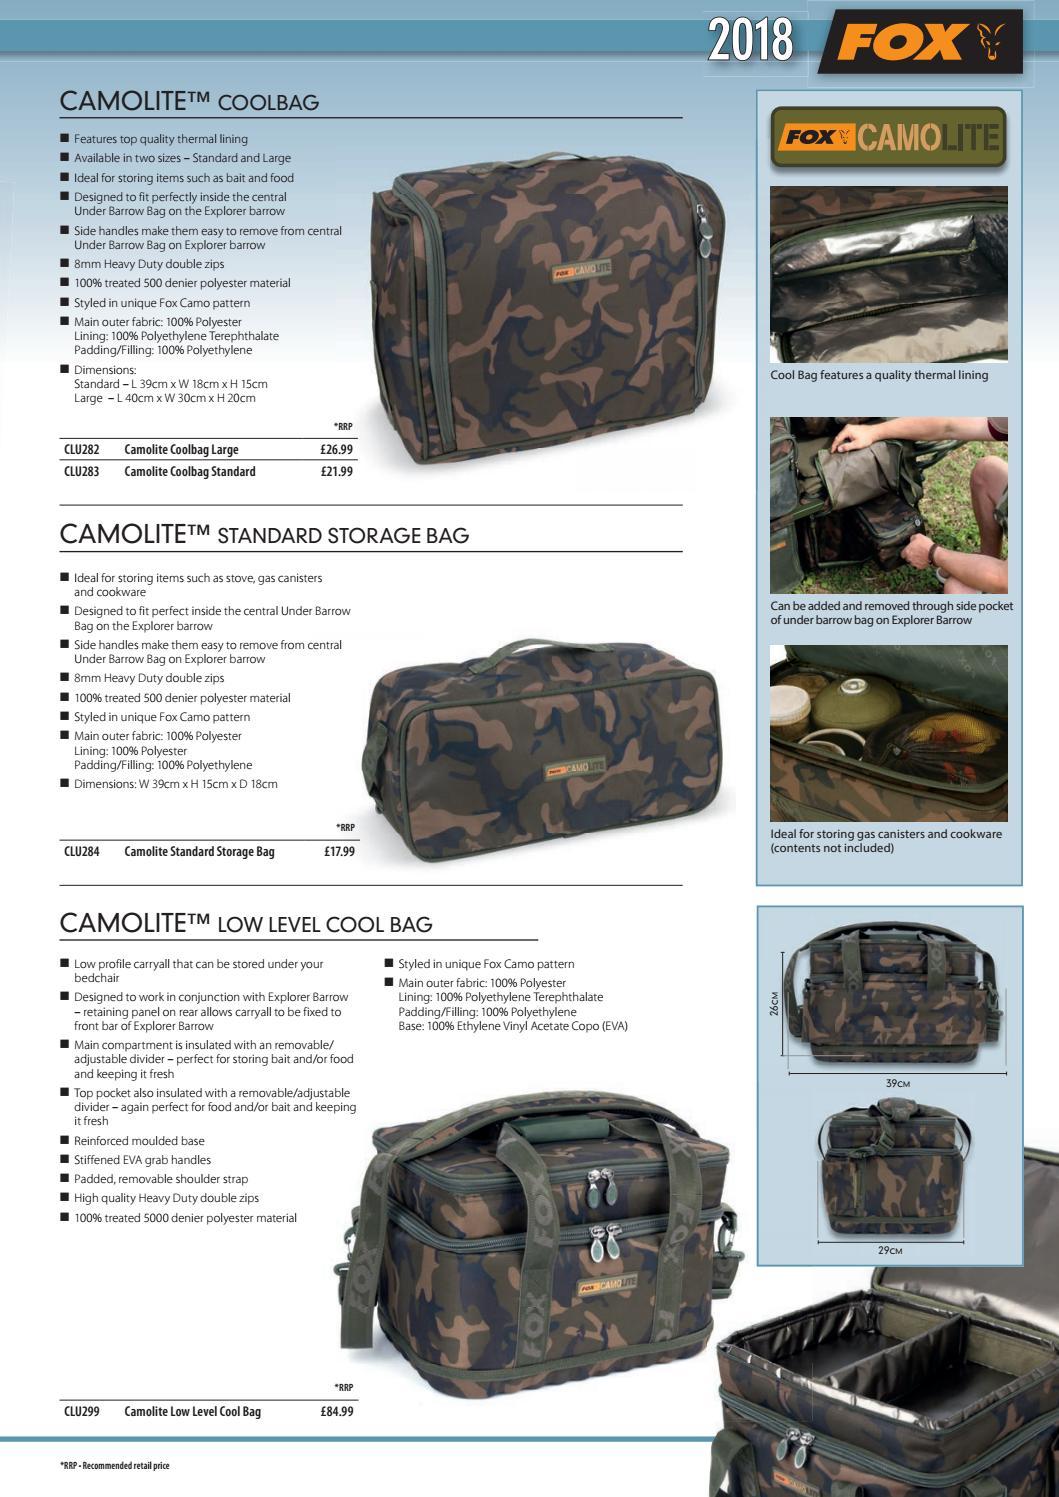 Fox Camolite Cool Bag Large